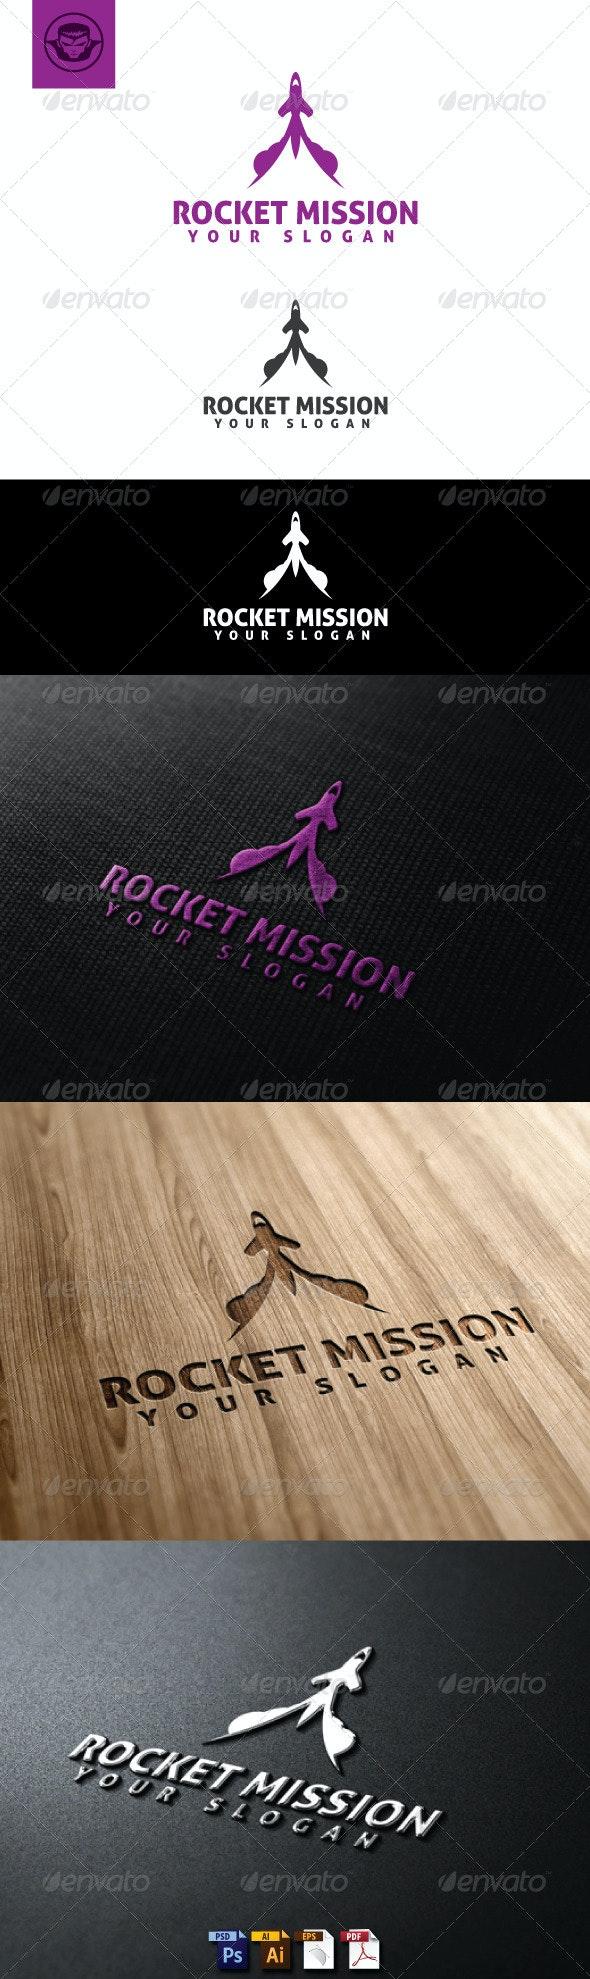 Rocket Mission Logo Template